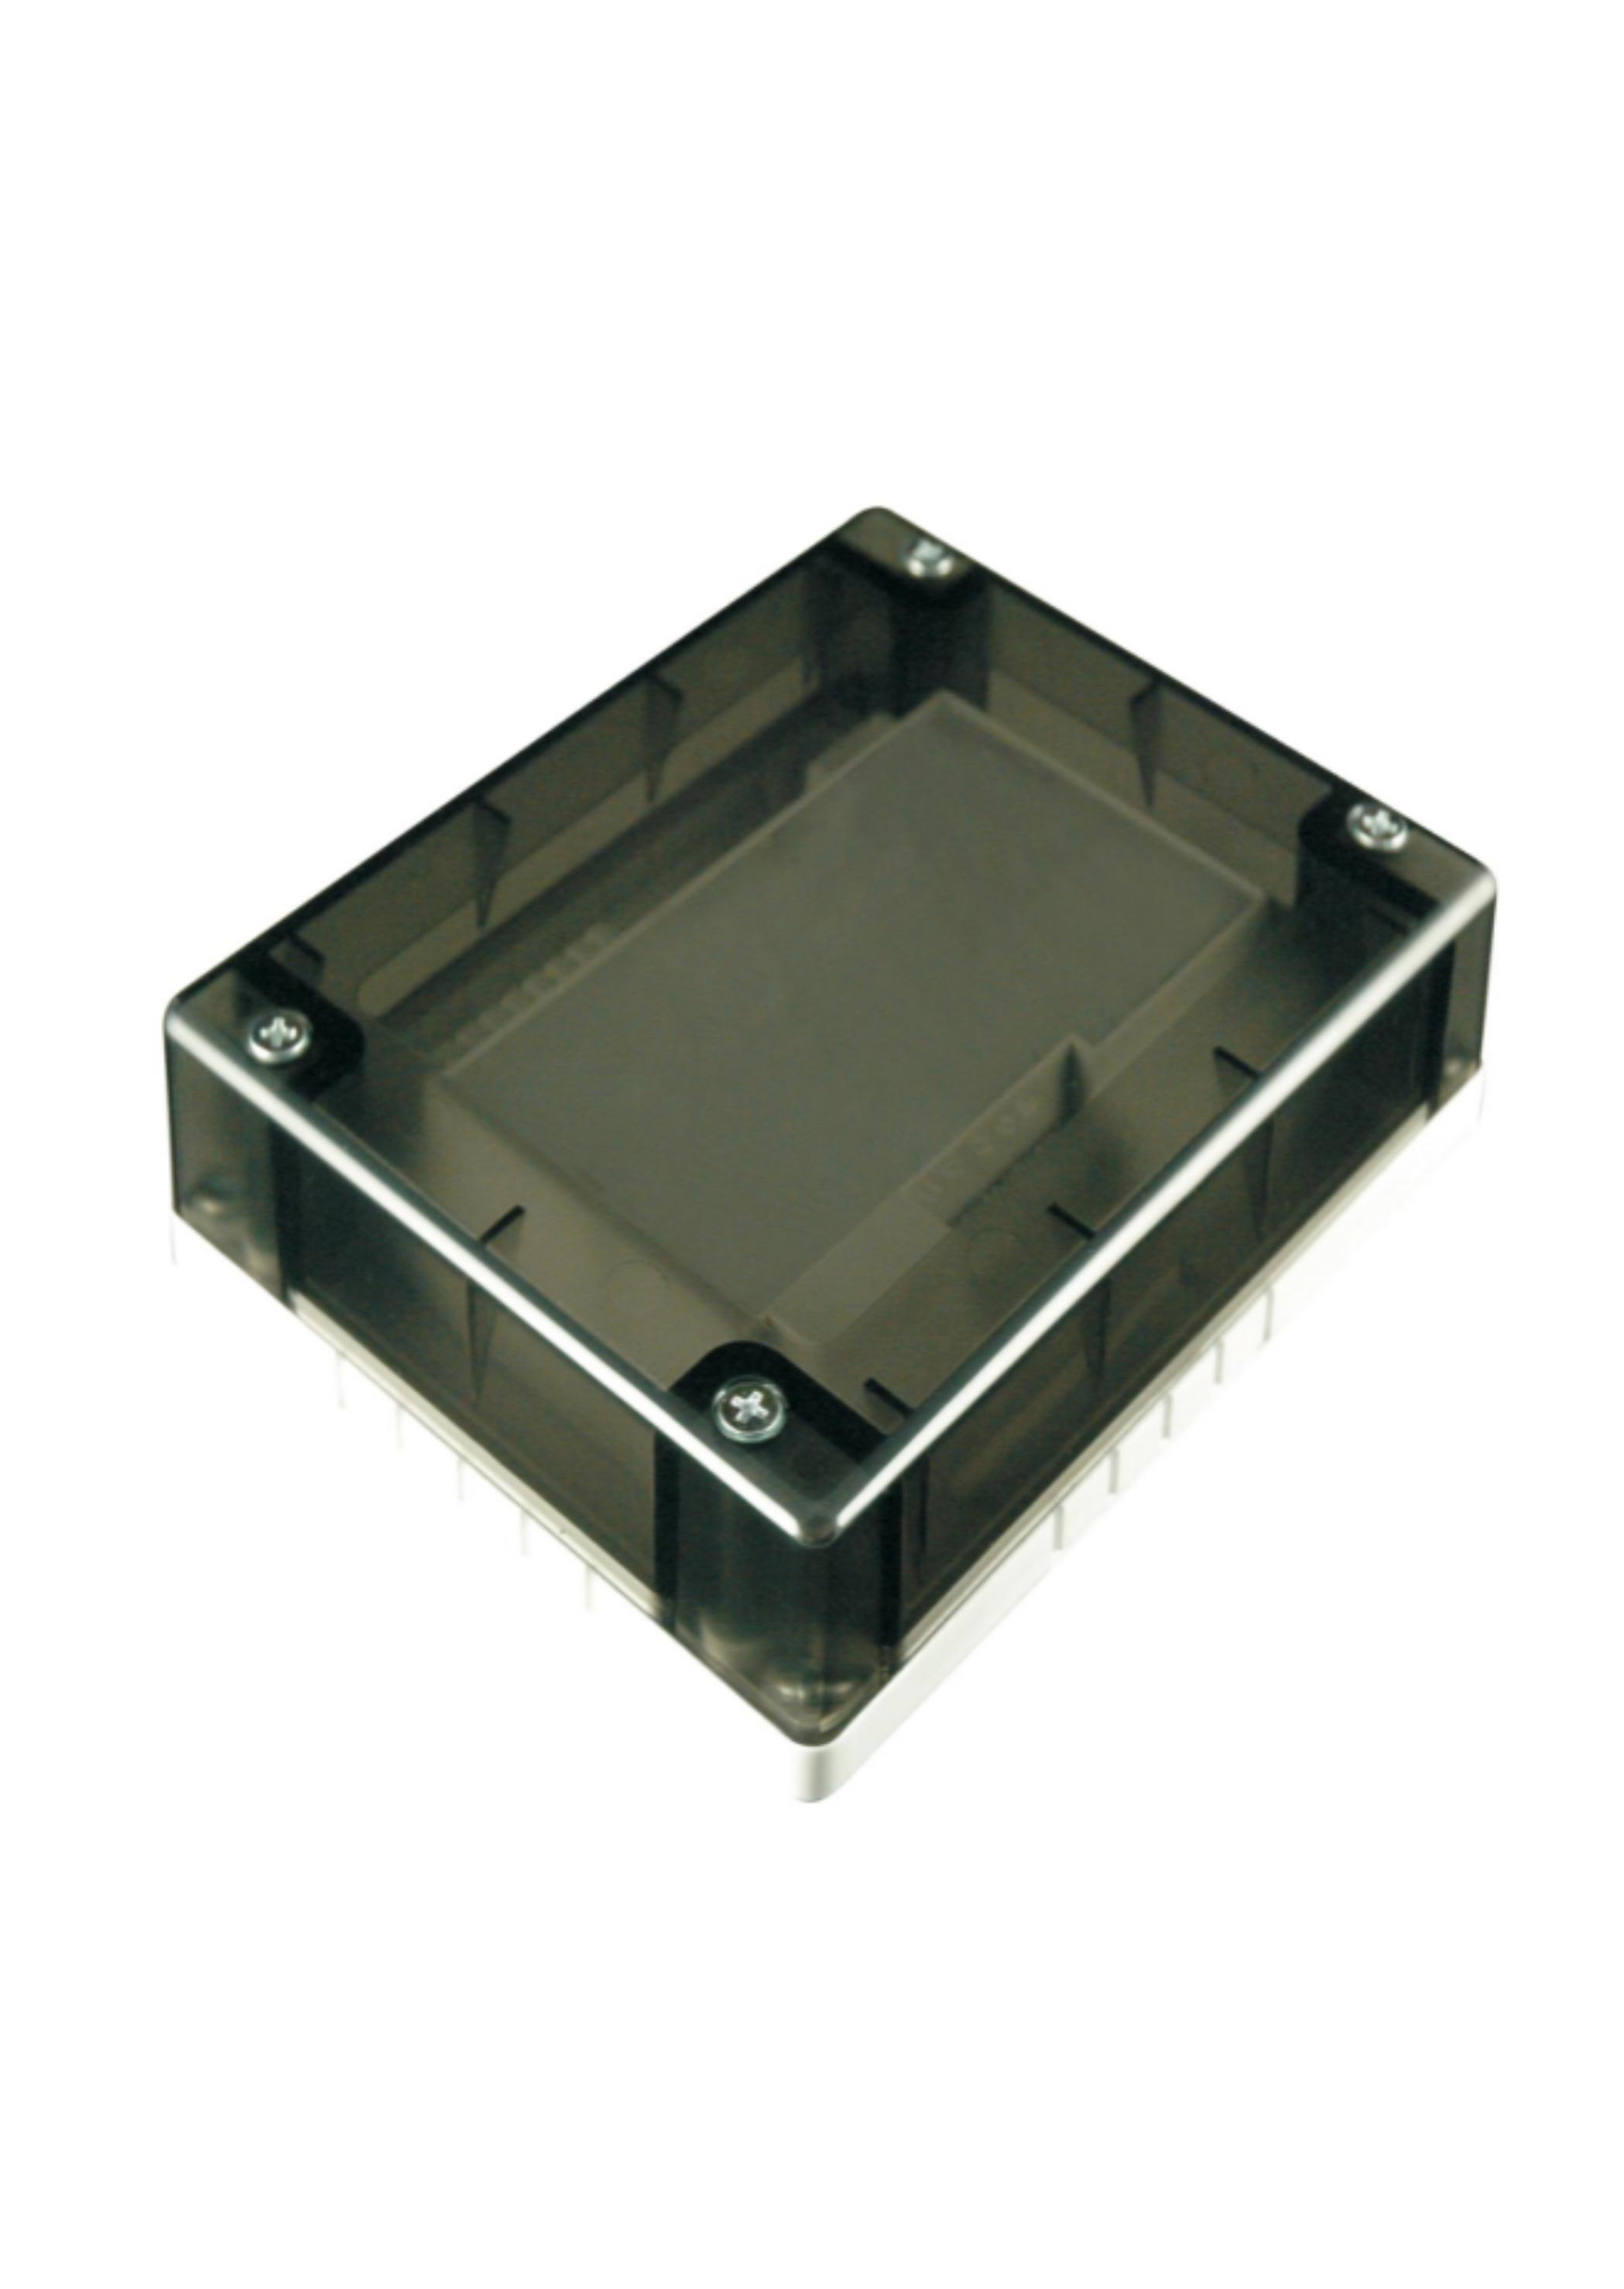 CHQ-BOX Sub Assembly 16702720-00